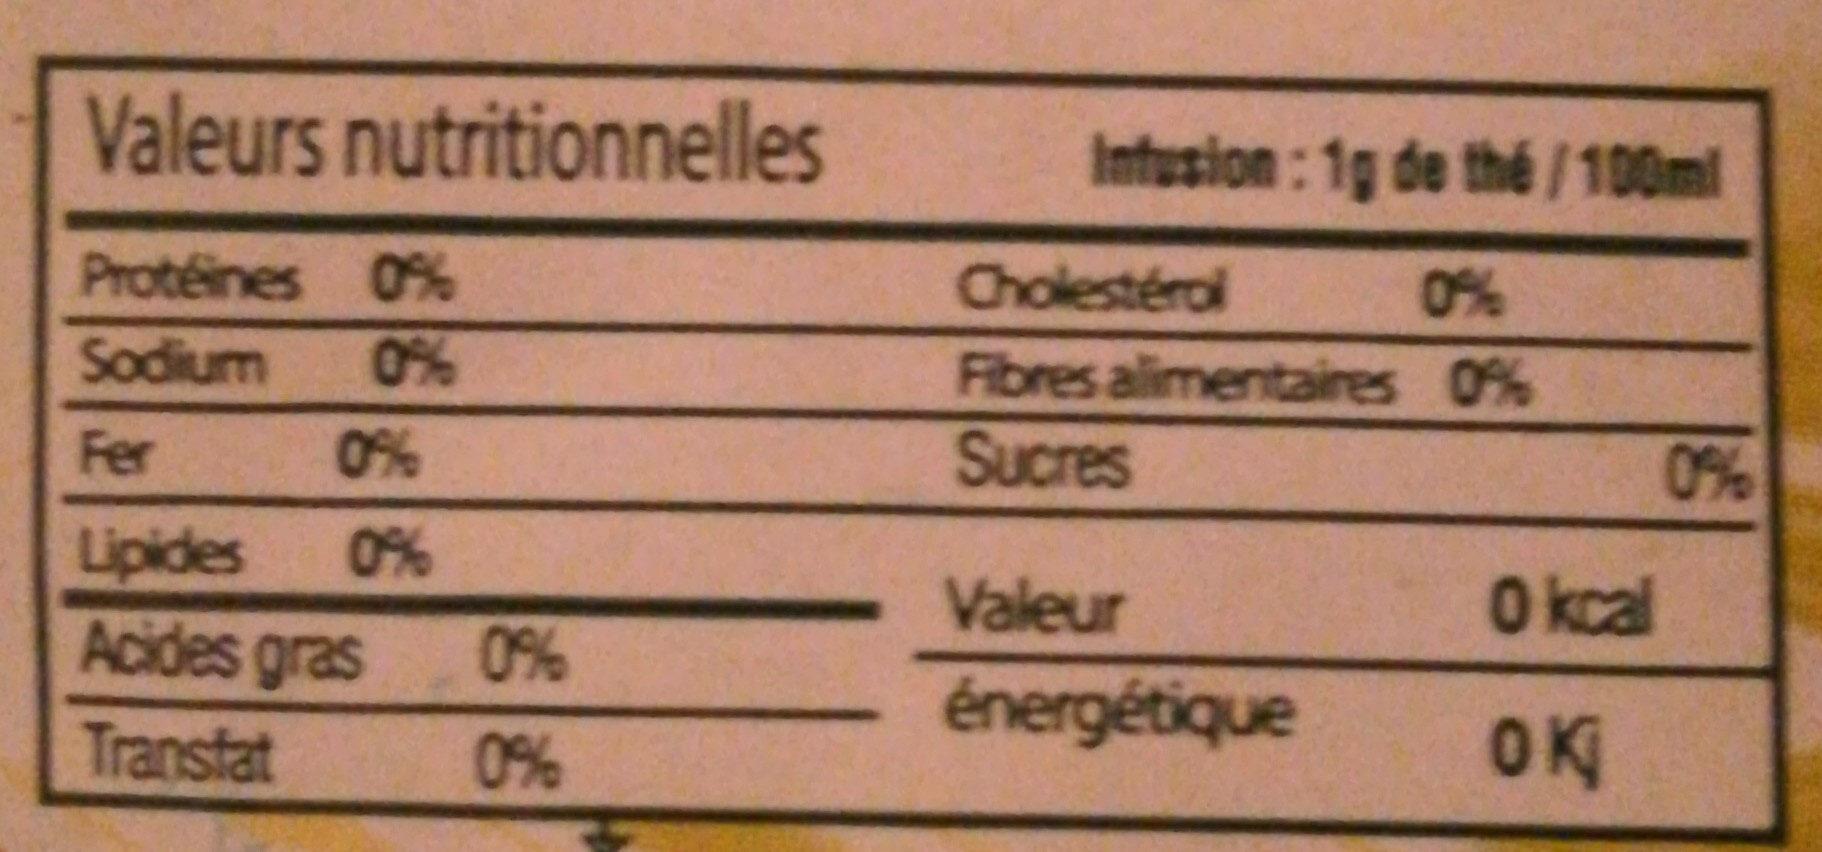 Verveine 100% - Informations nutritionnelles - fr